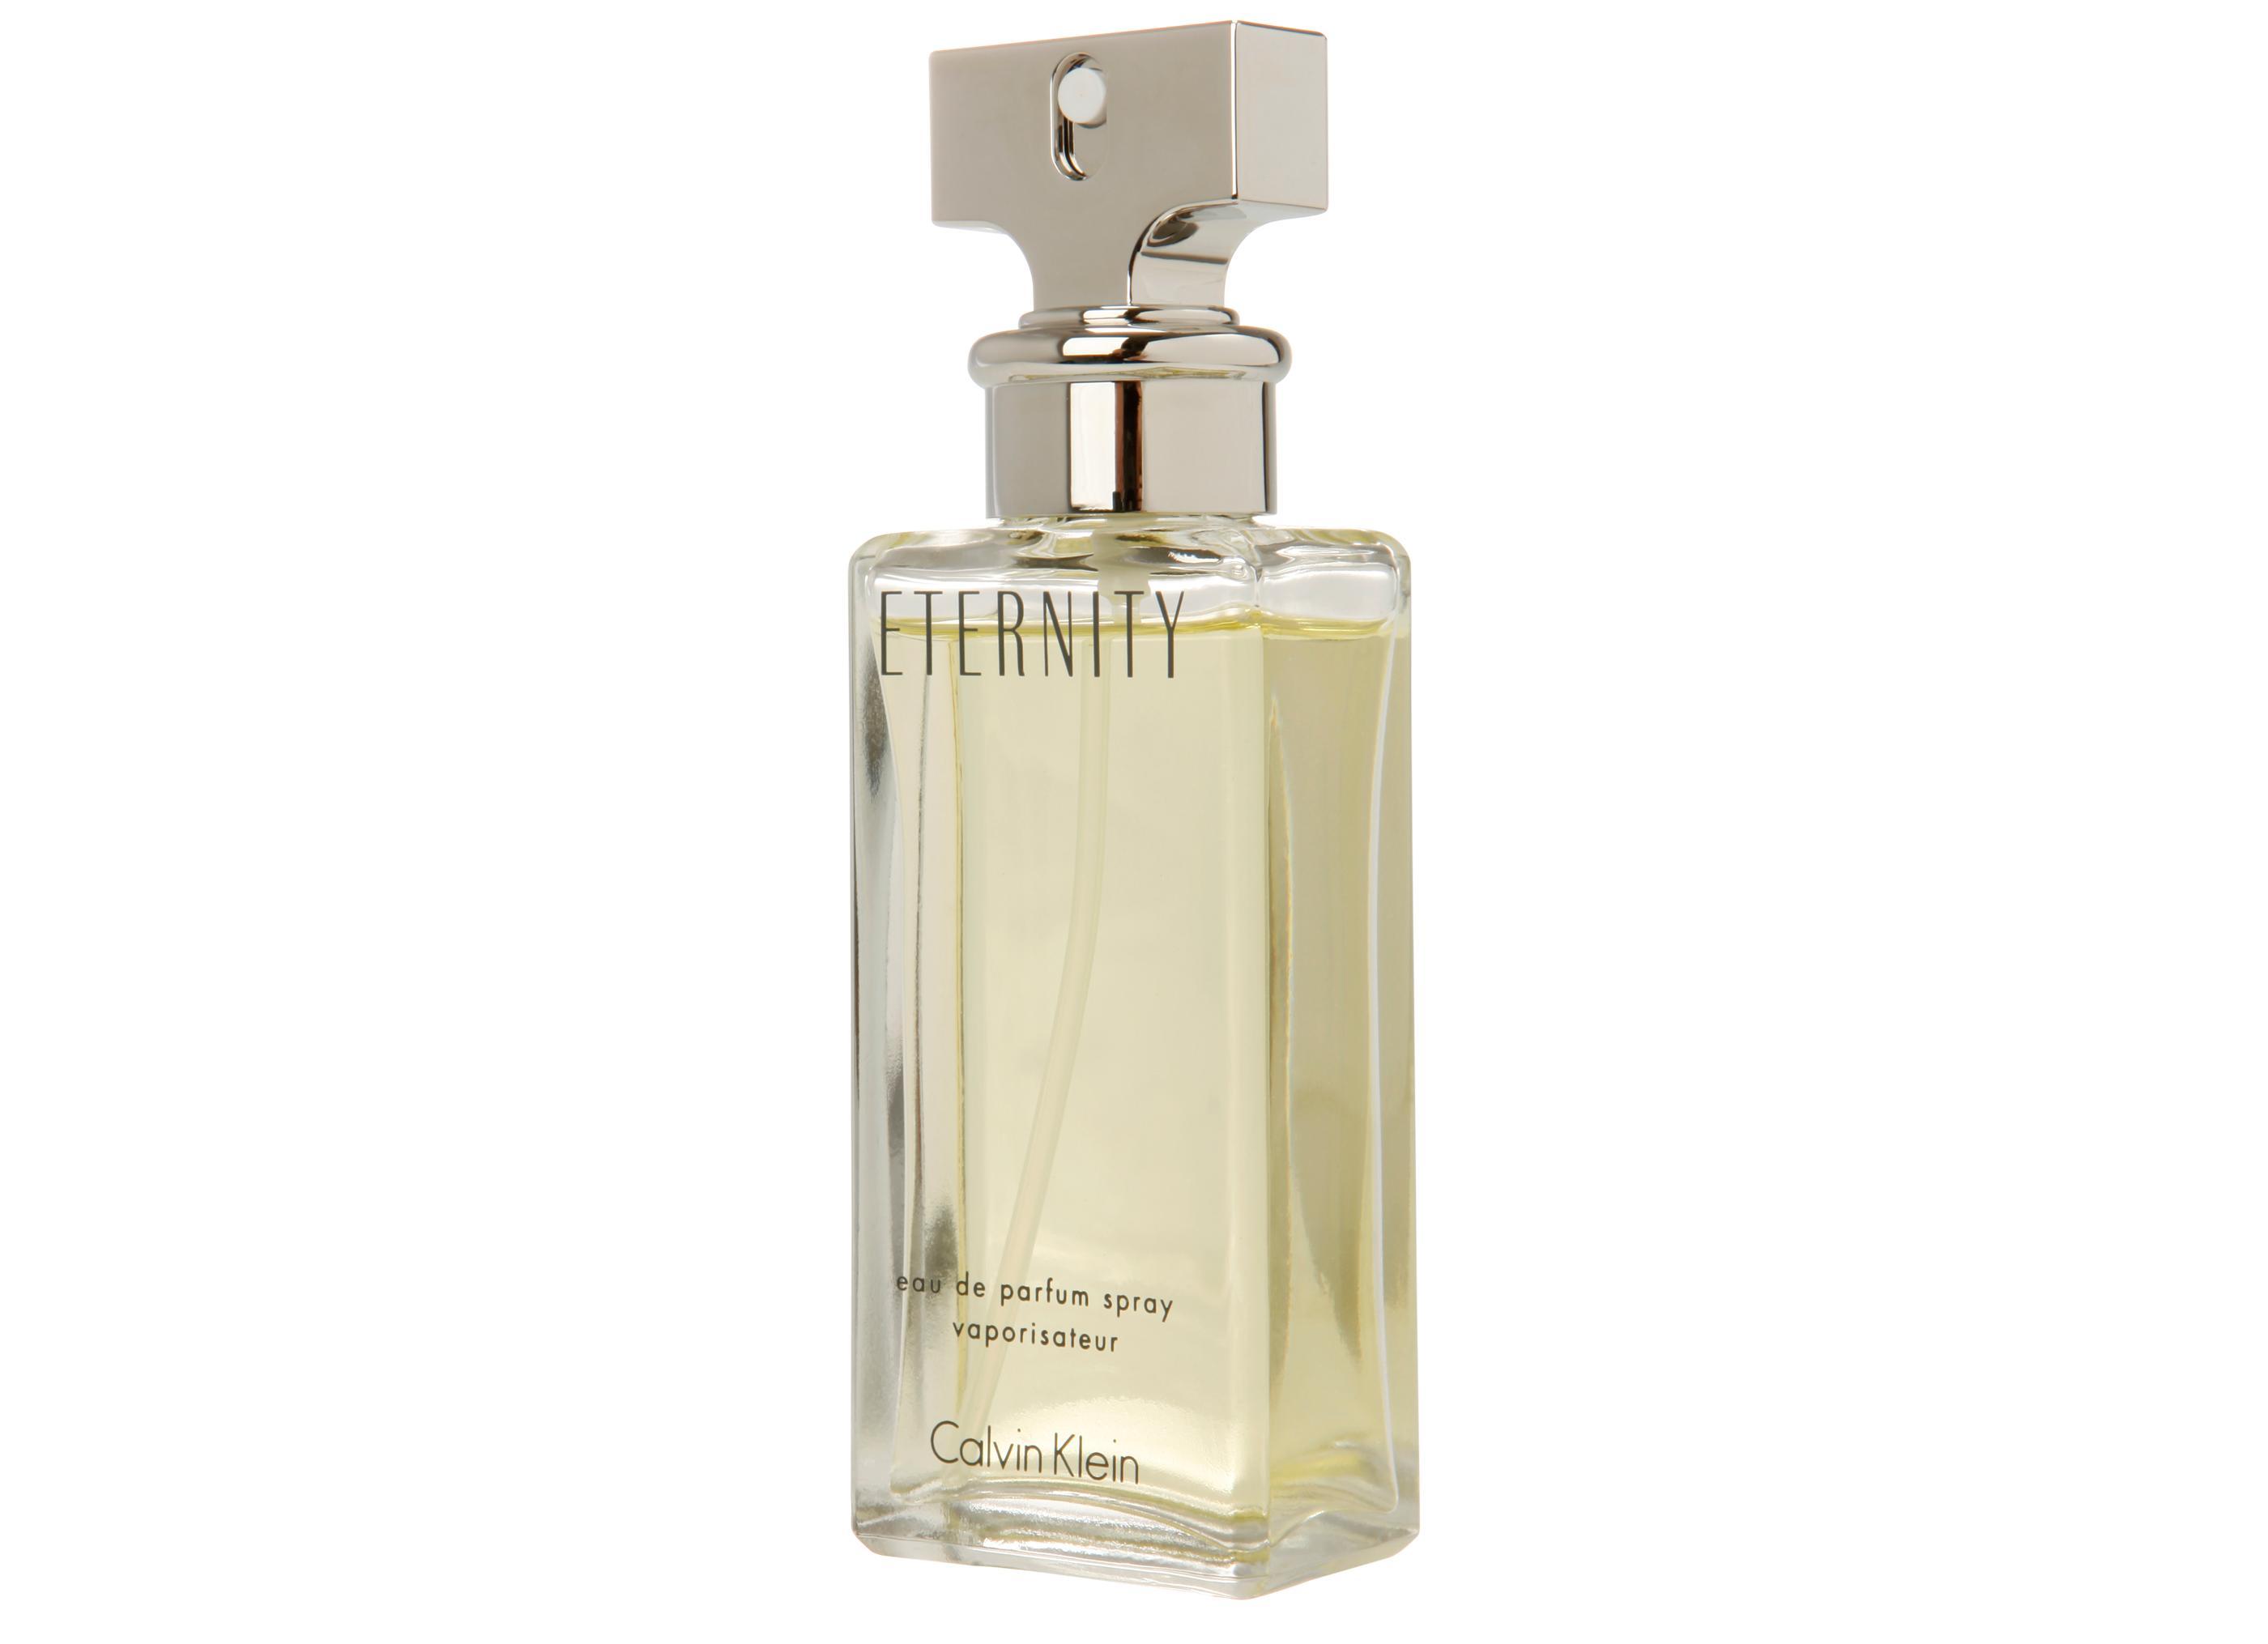 calvin klein eternity 50 ml parfum. Black Bedroom Furniture Sets. Home Design Ideas